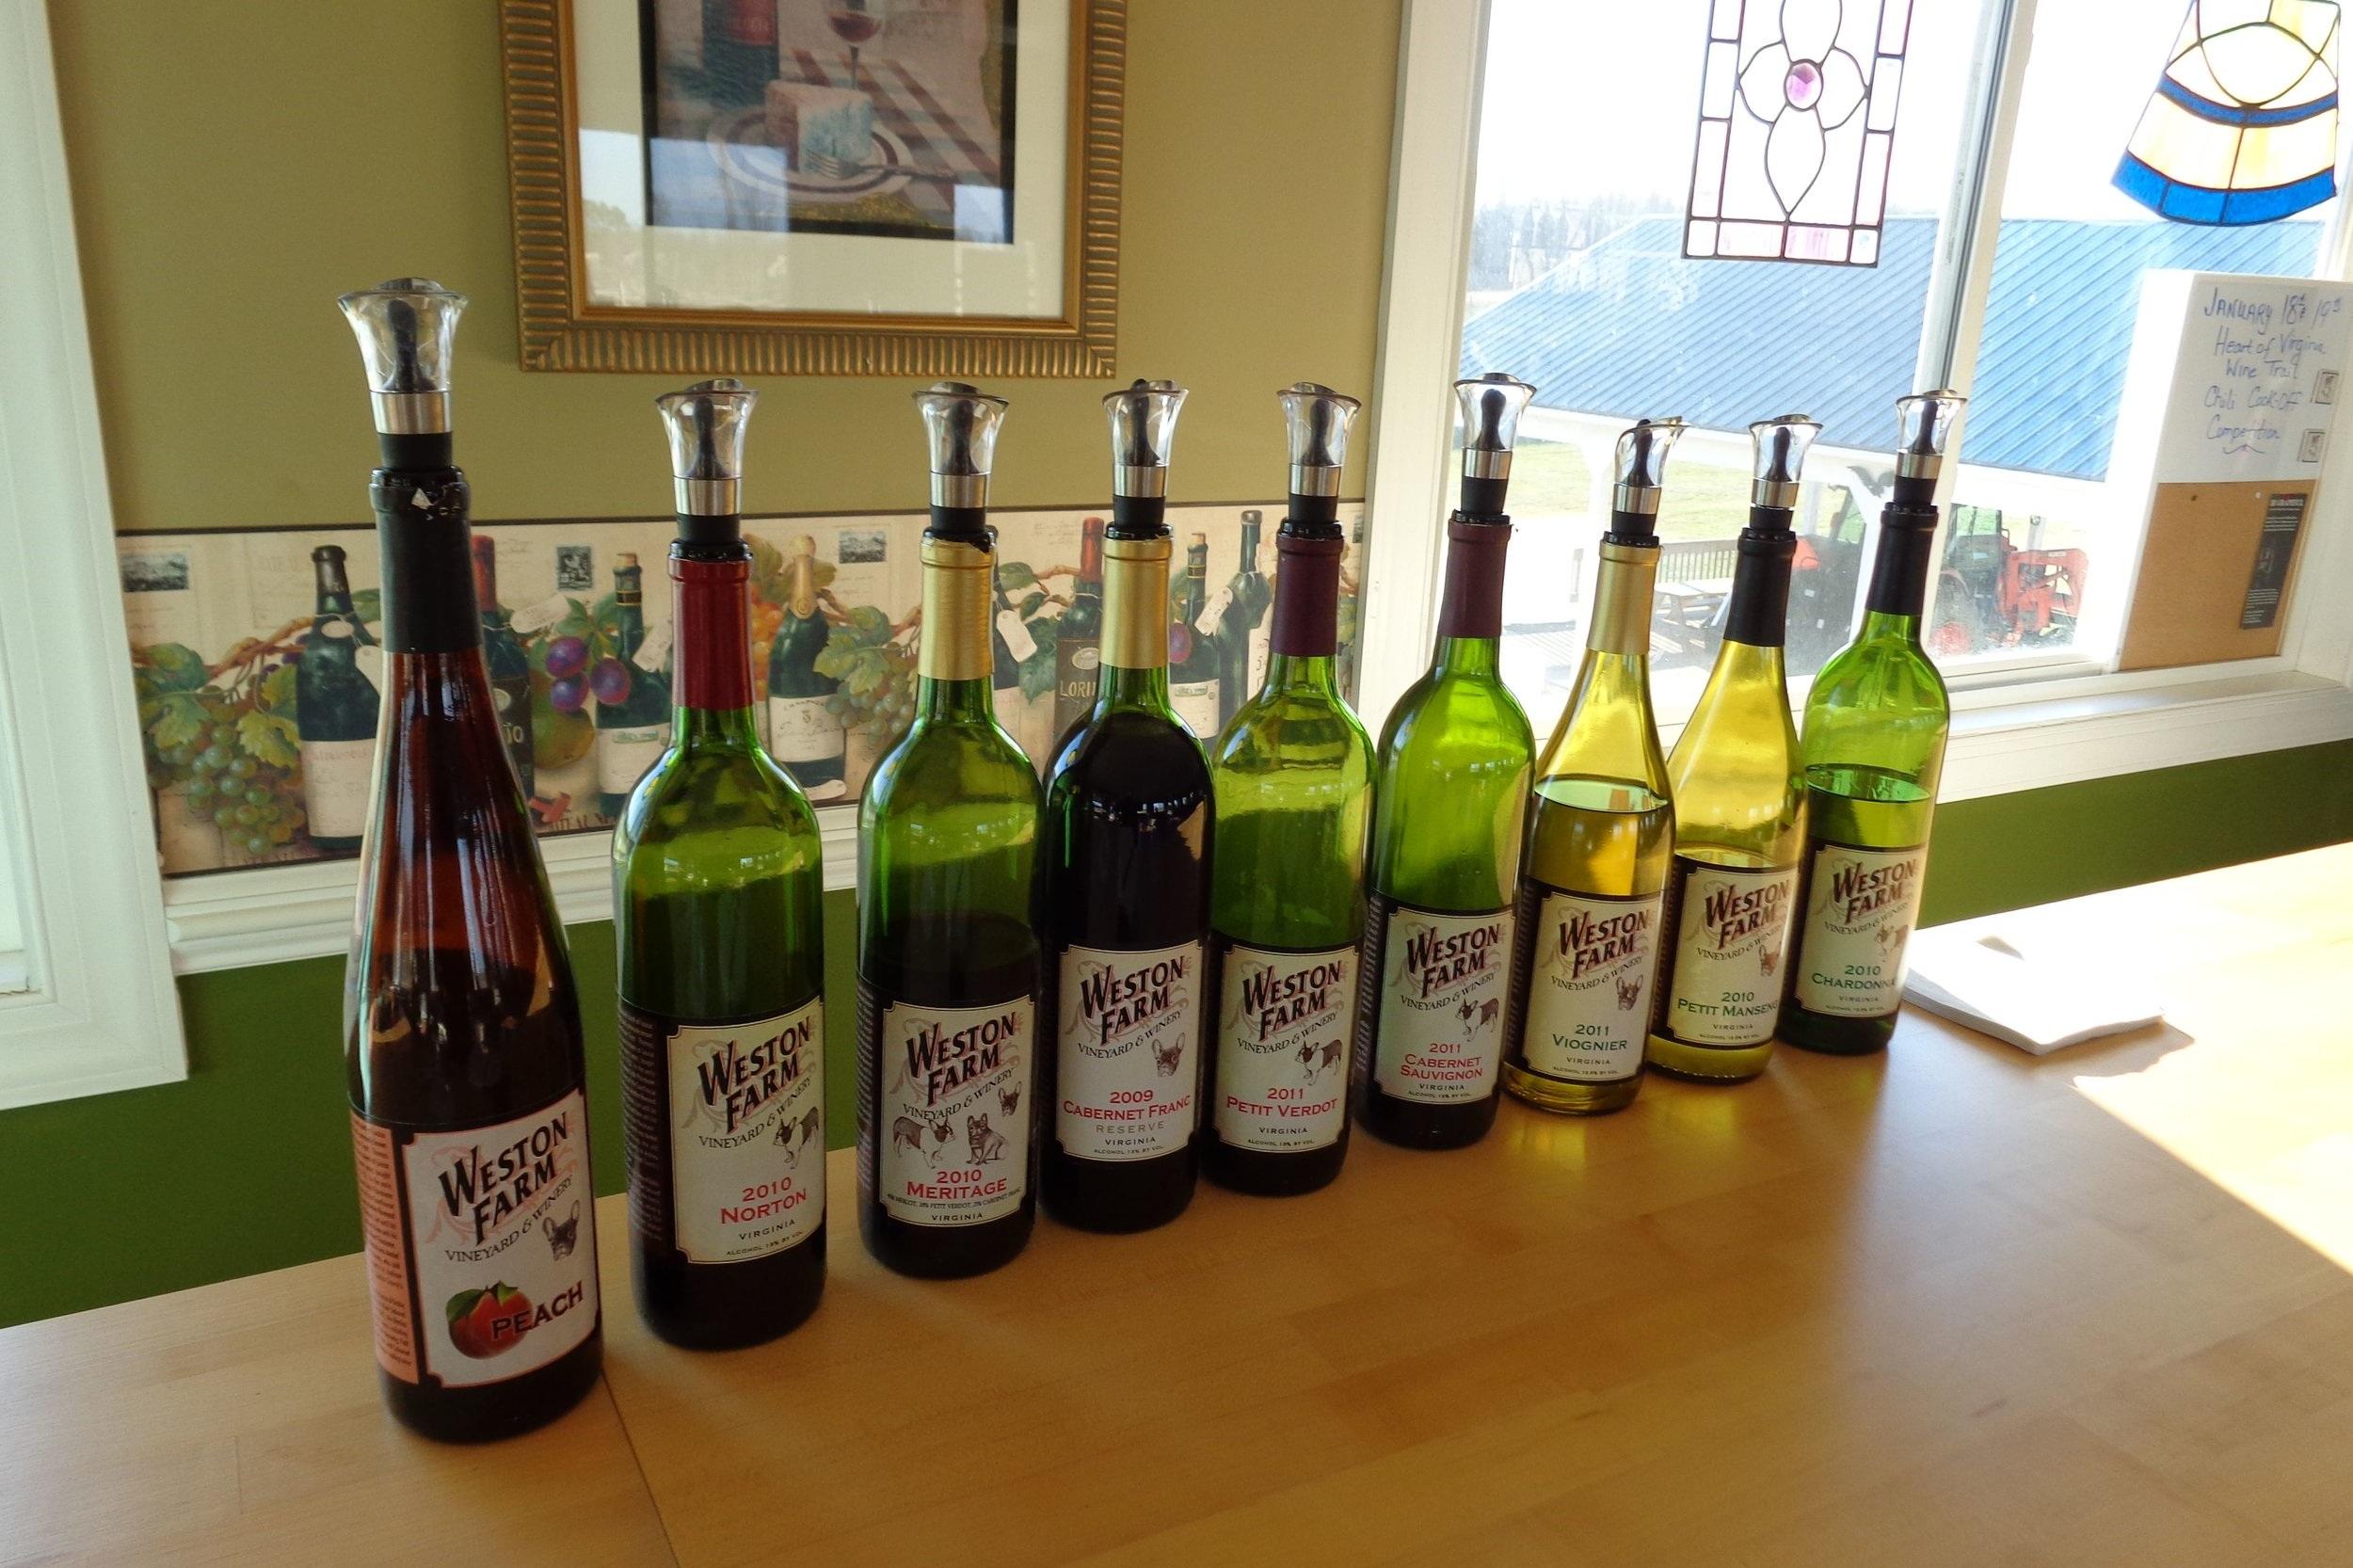 Weston Farm Vineyards and Winery